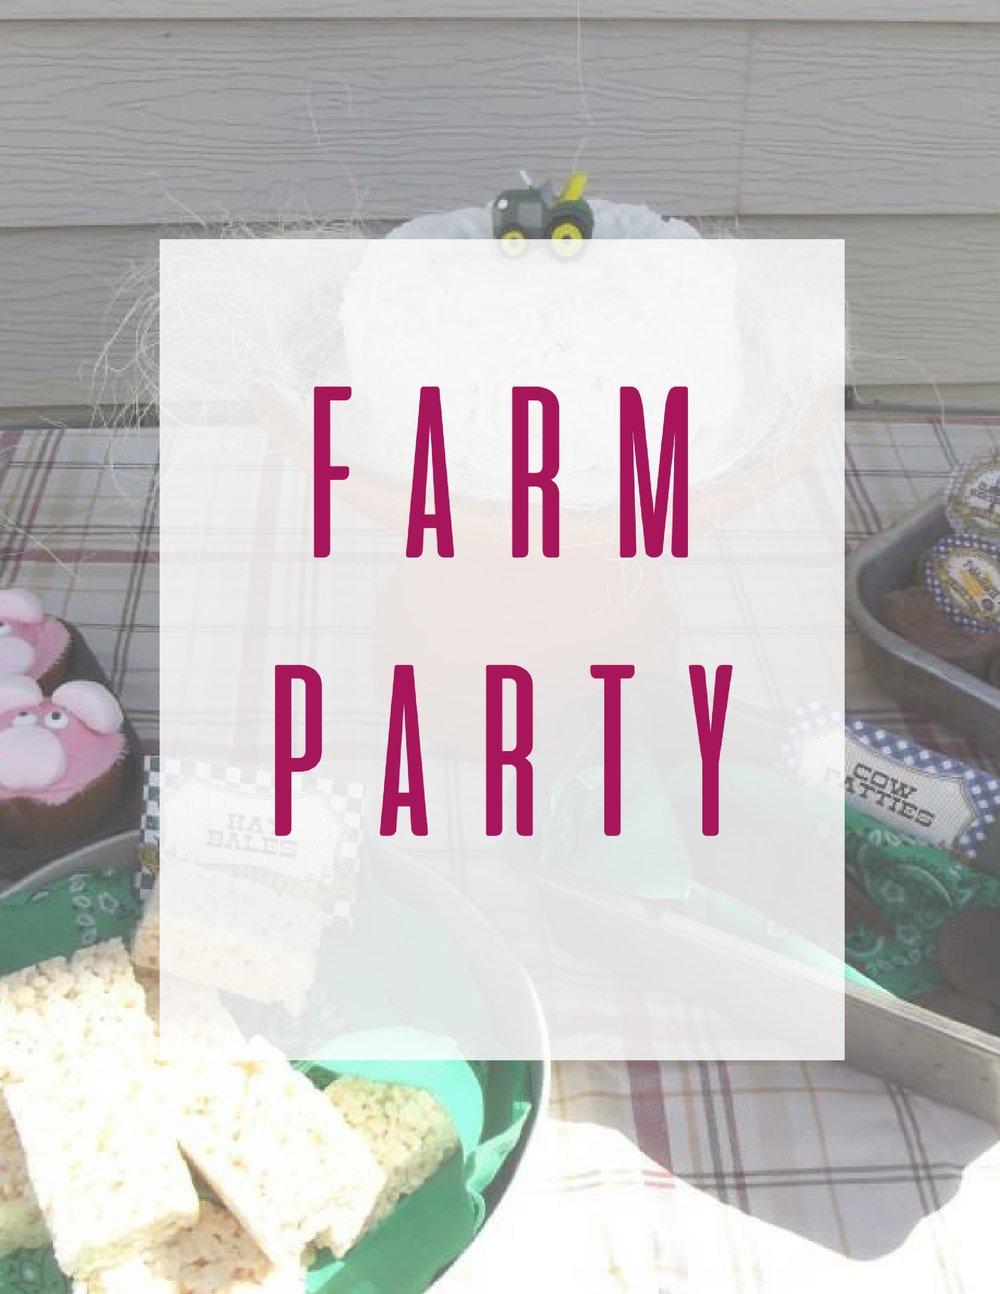 LIBRARY- FARM PARTY.jpg